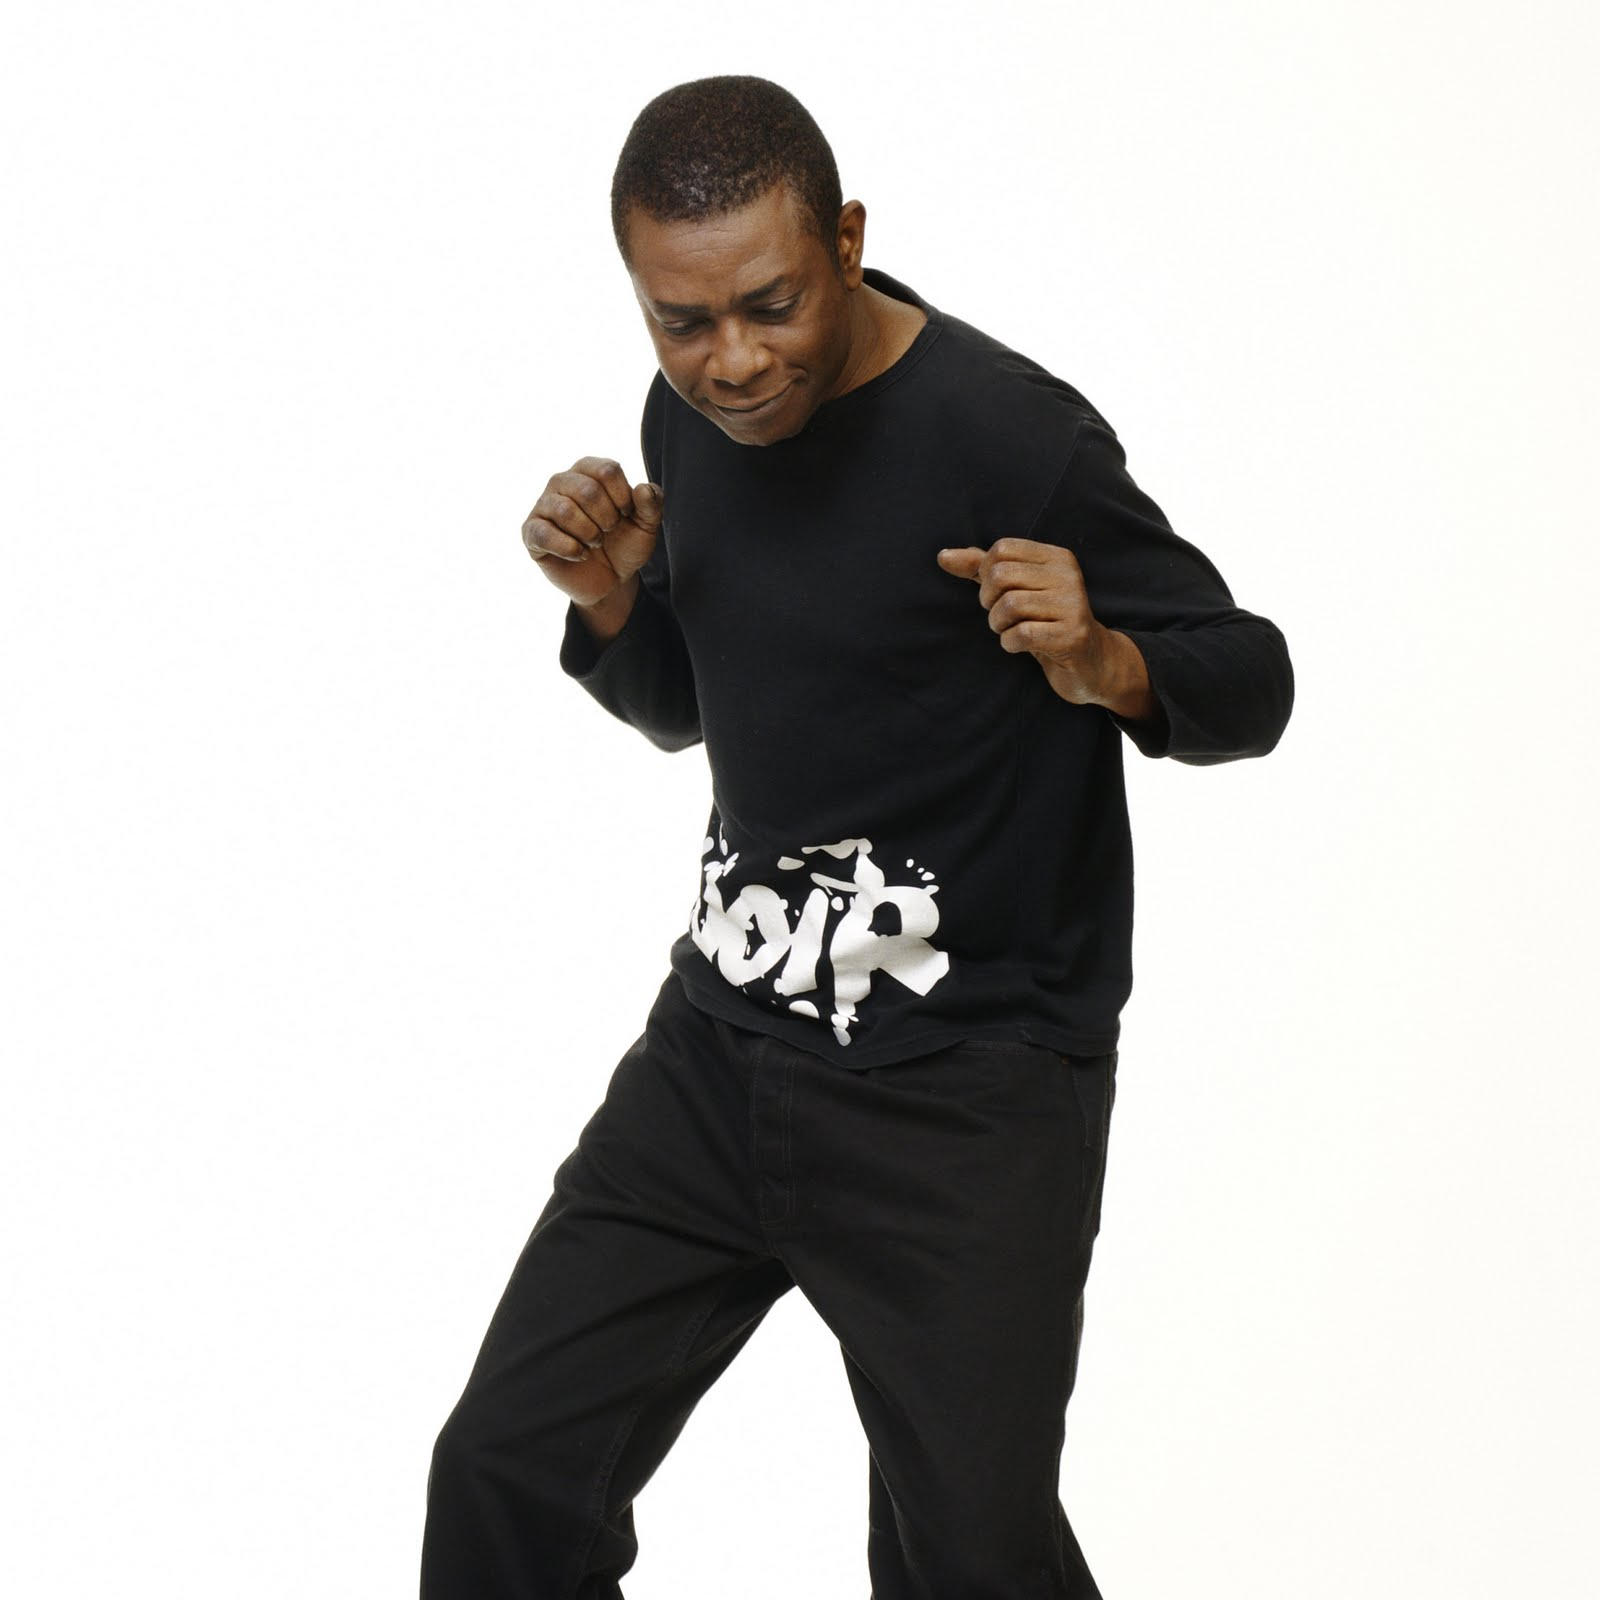 http://2.bp.blogspot.com/-6N46buawLlA/Tdq5p9KeJiI/AAAAAAAAC04/5SaIk8nomzA/s1600/Youssou%252BNdour%252BYouriLanquette.jpg